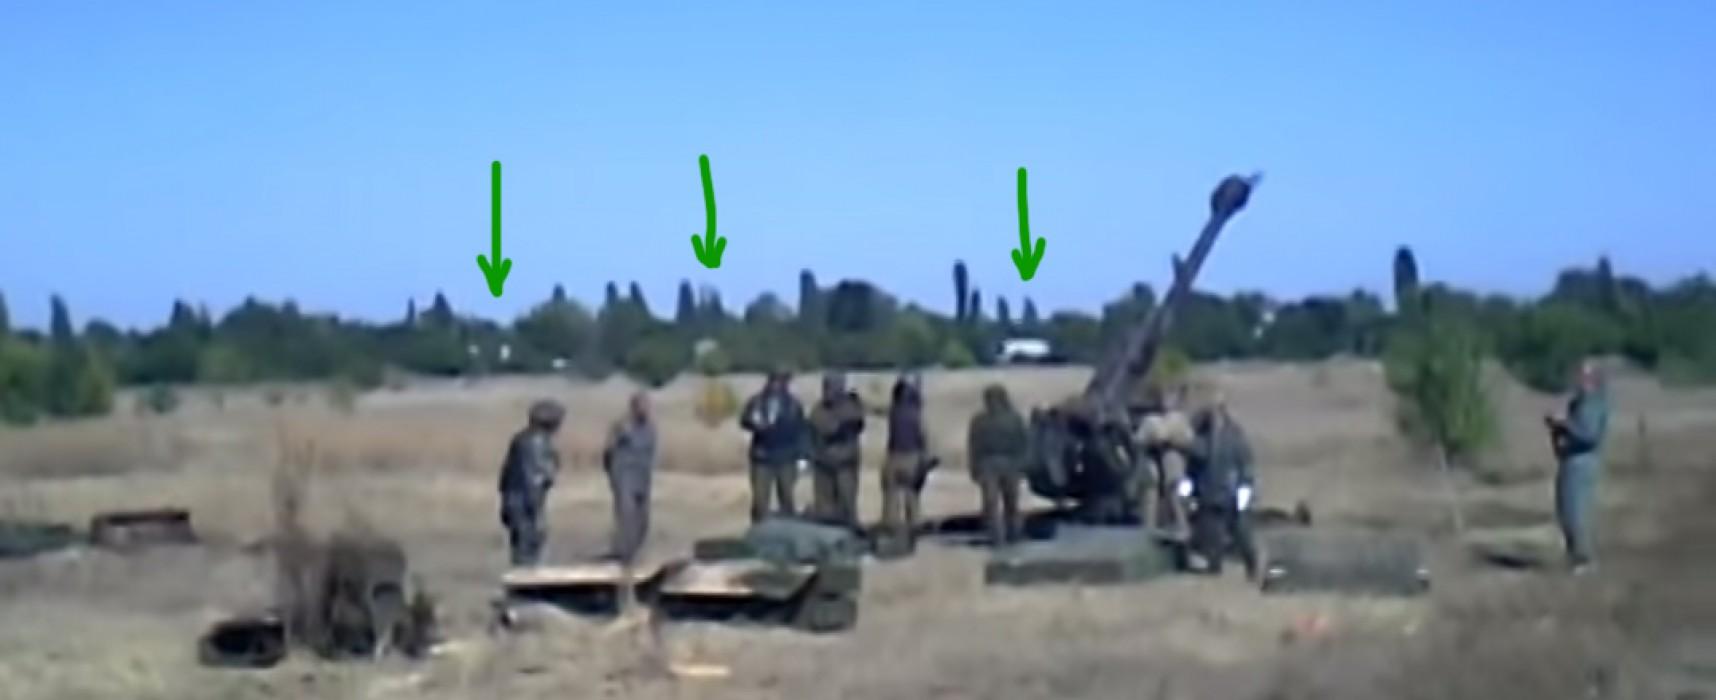 Warcrime: Graham Phillips documenting shelling of villages?